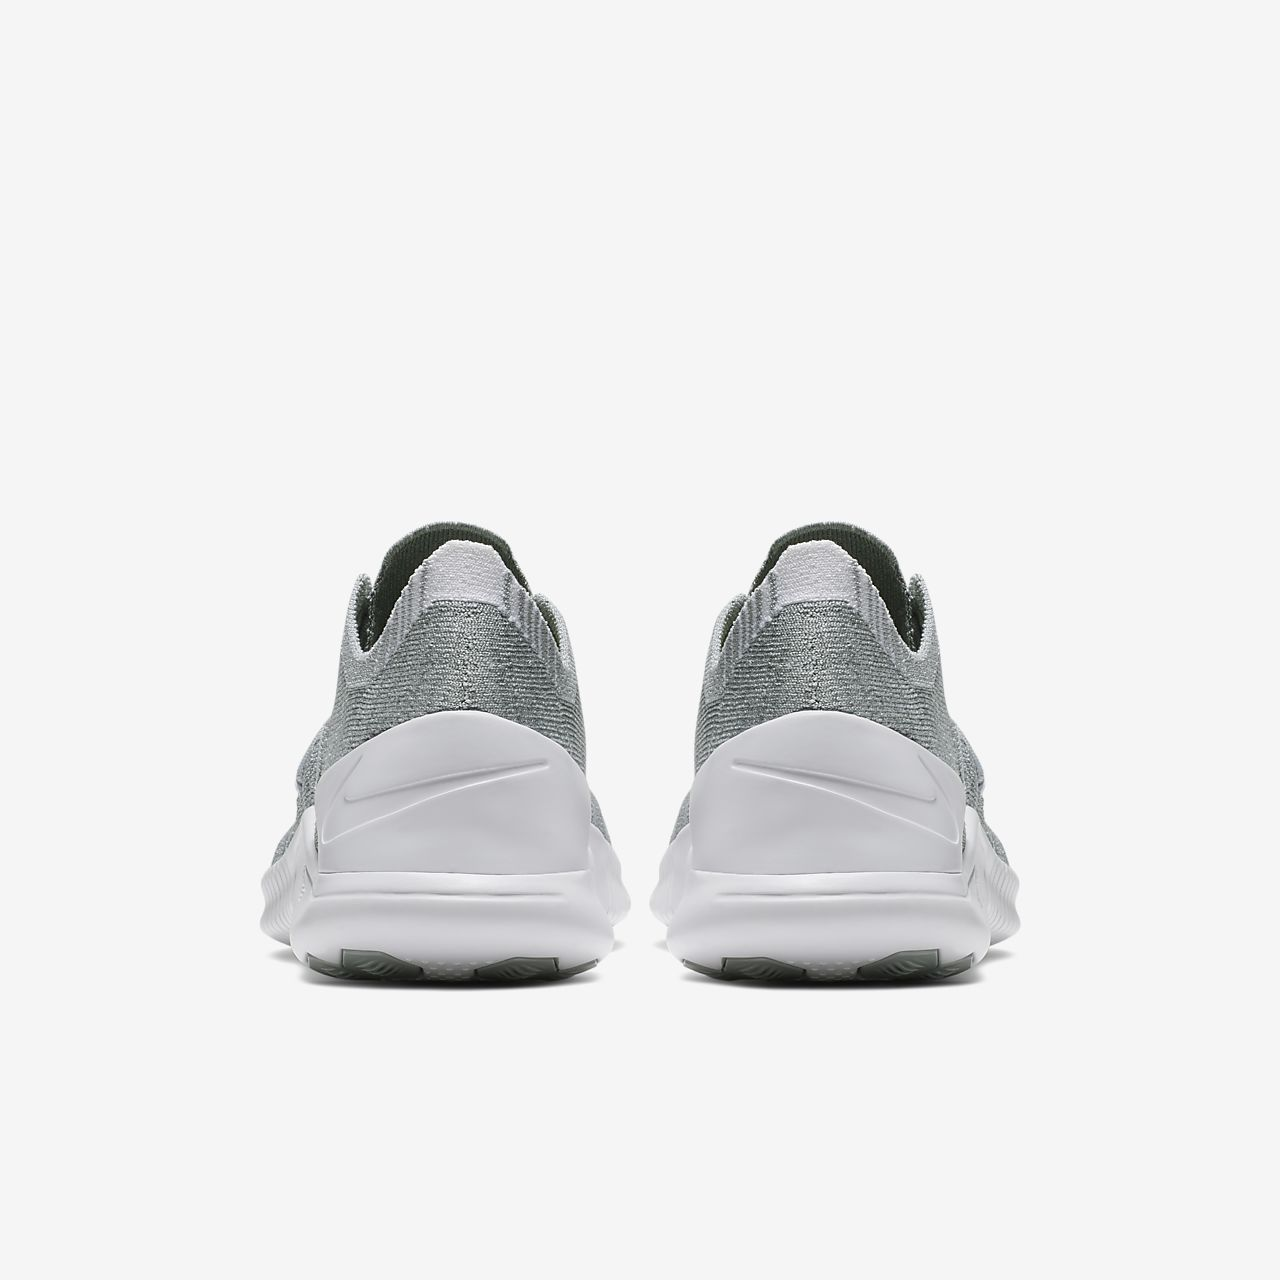 Nike Free TR TR TR Flyknit 3 Damen-Trainingsschuh      Schnelle Lieferung  0e1507